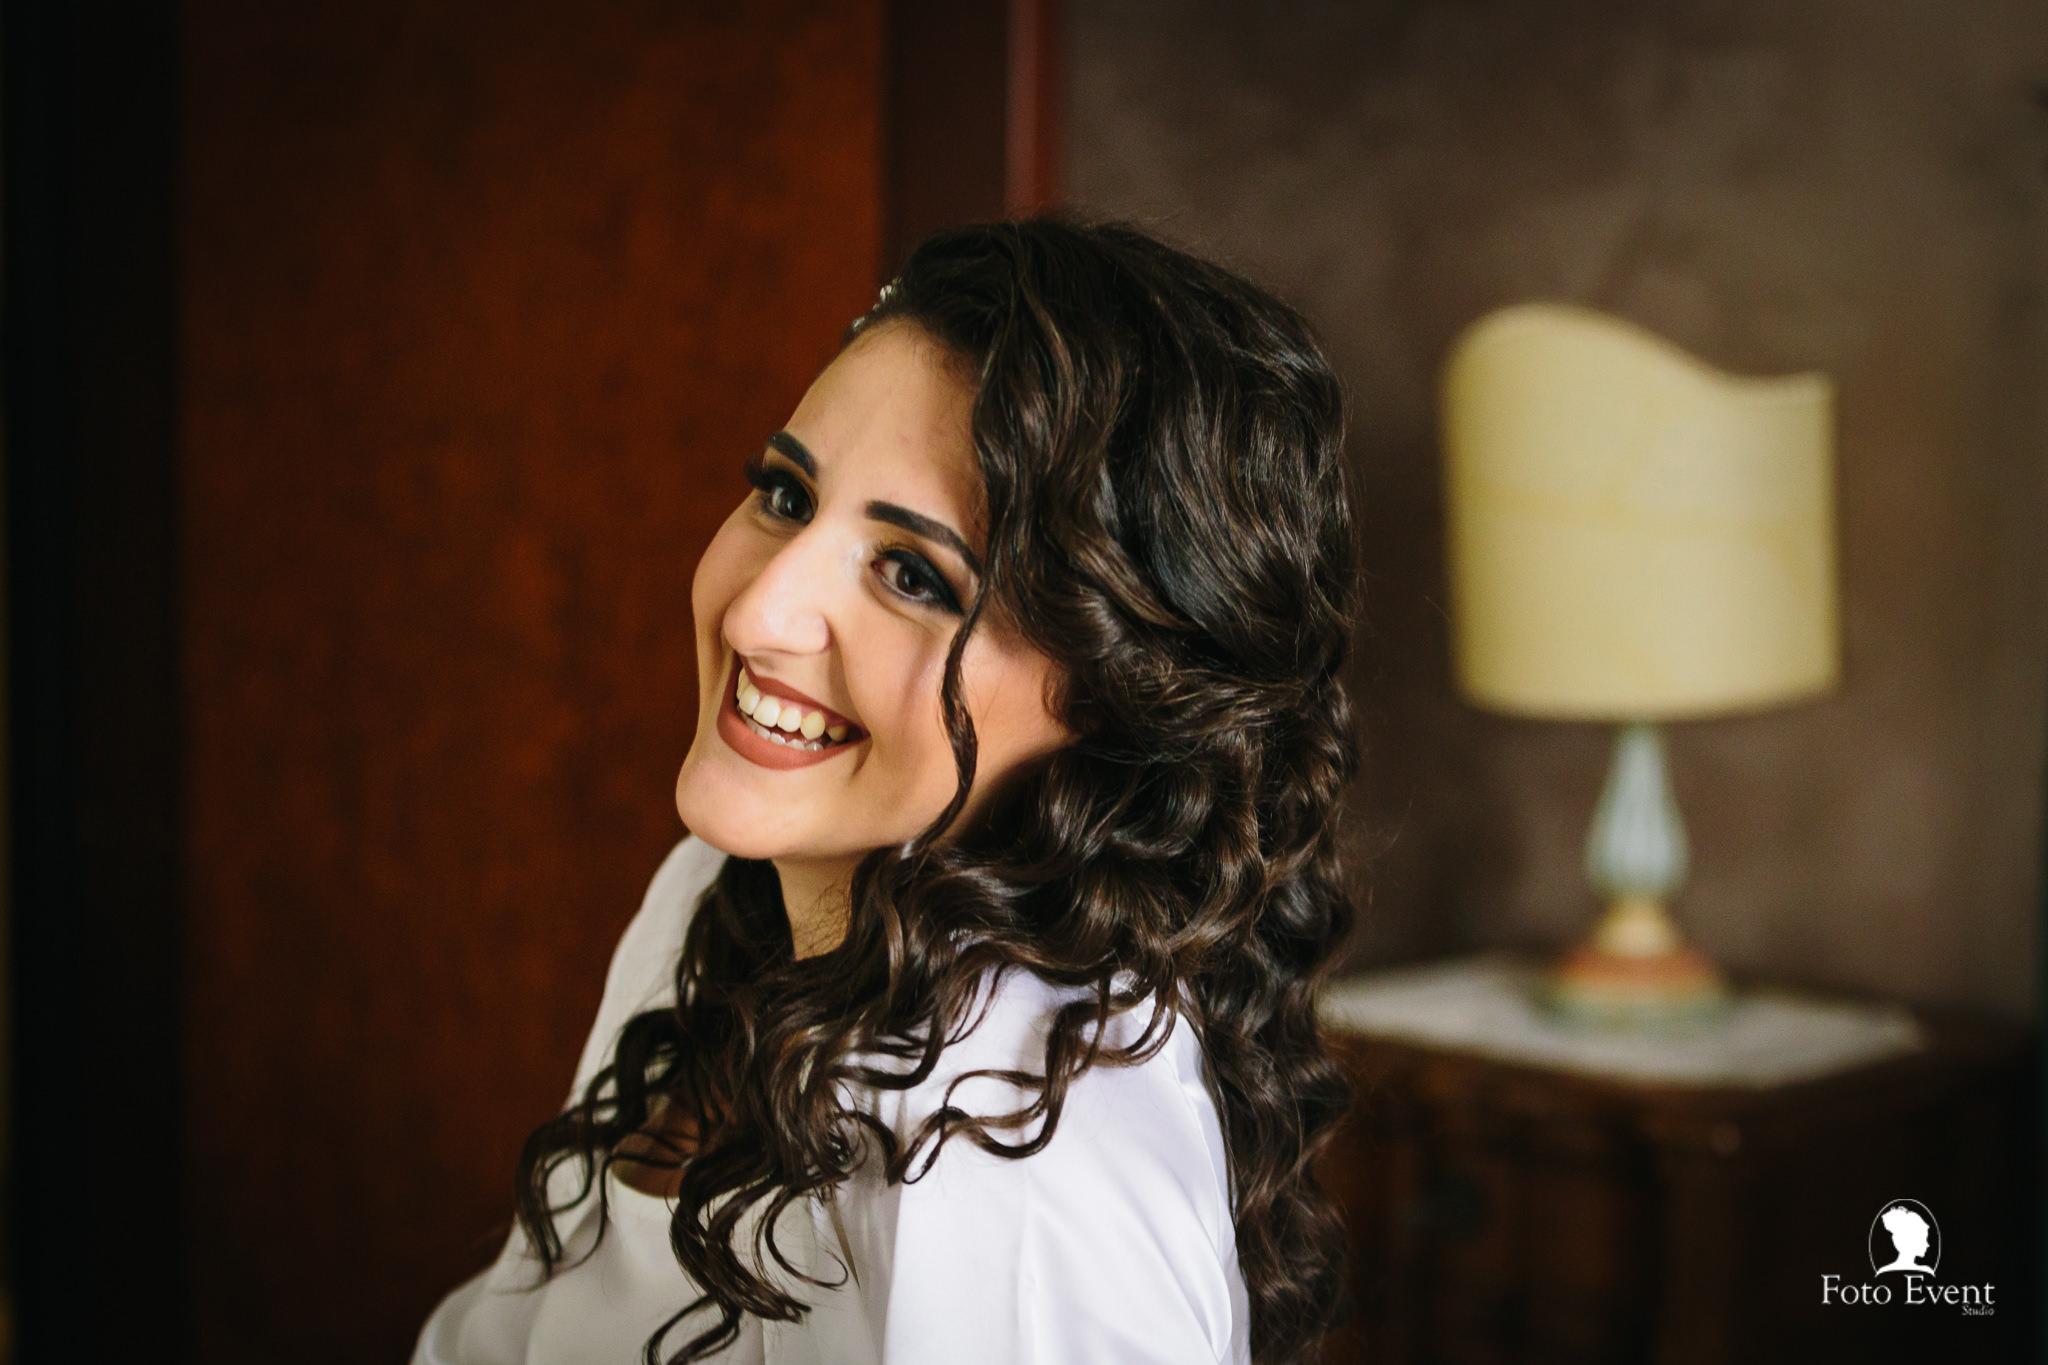 016-2019-08-31-Matrimonio-Serena-e-Saverio-Tarantino-zoom-135